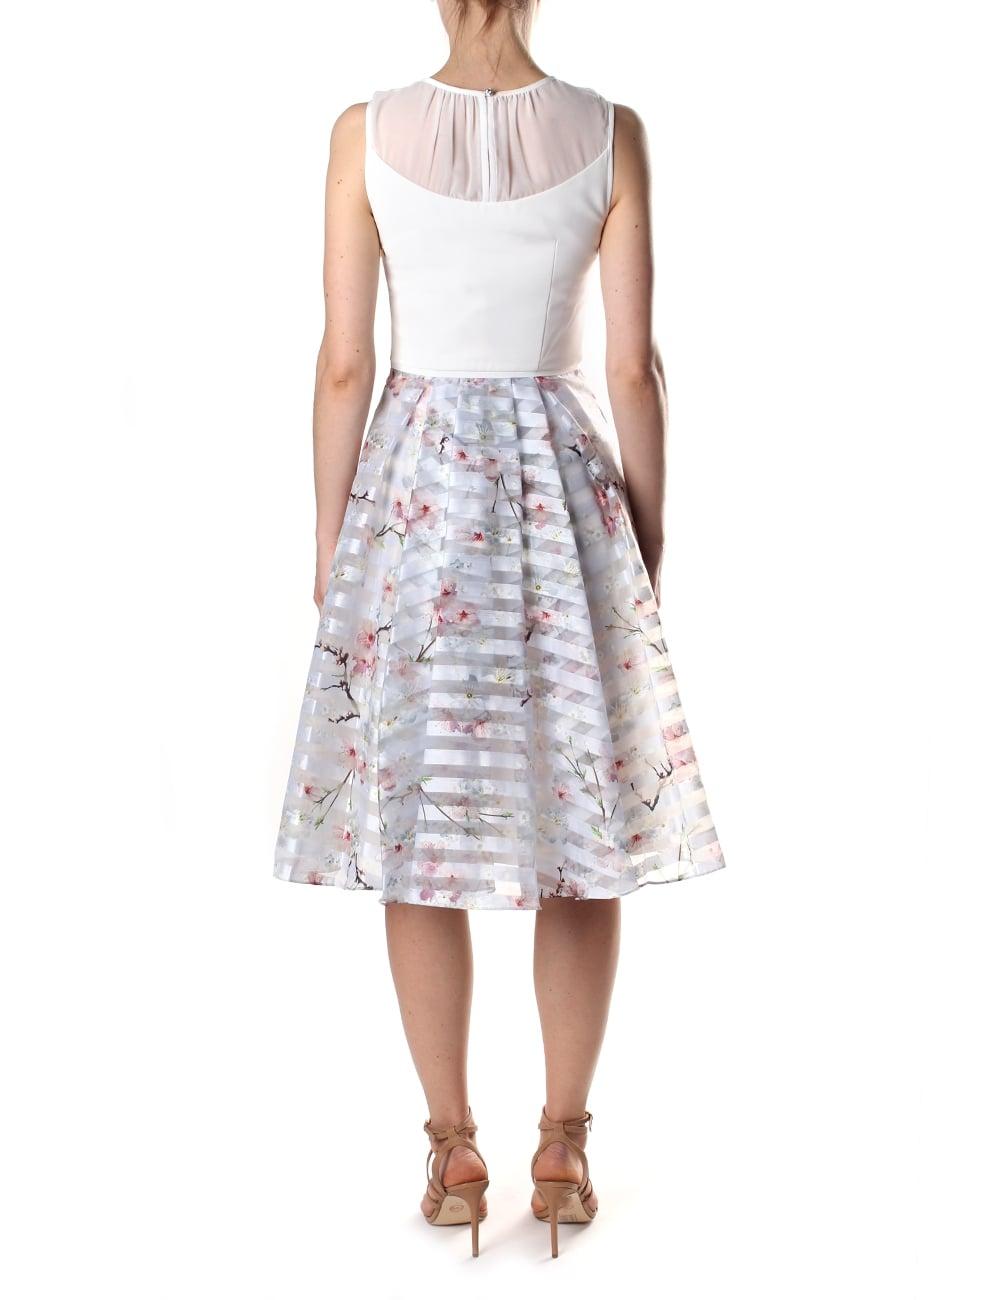 5ec07174a Ted baker womens monah oriental blossom contrast dress jpg 1000x1300 Ted  baker lavender dress